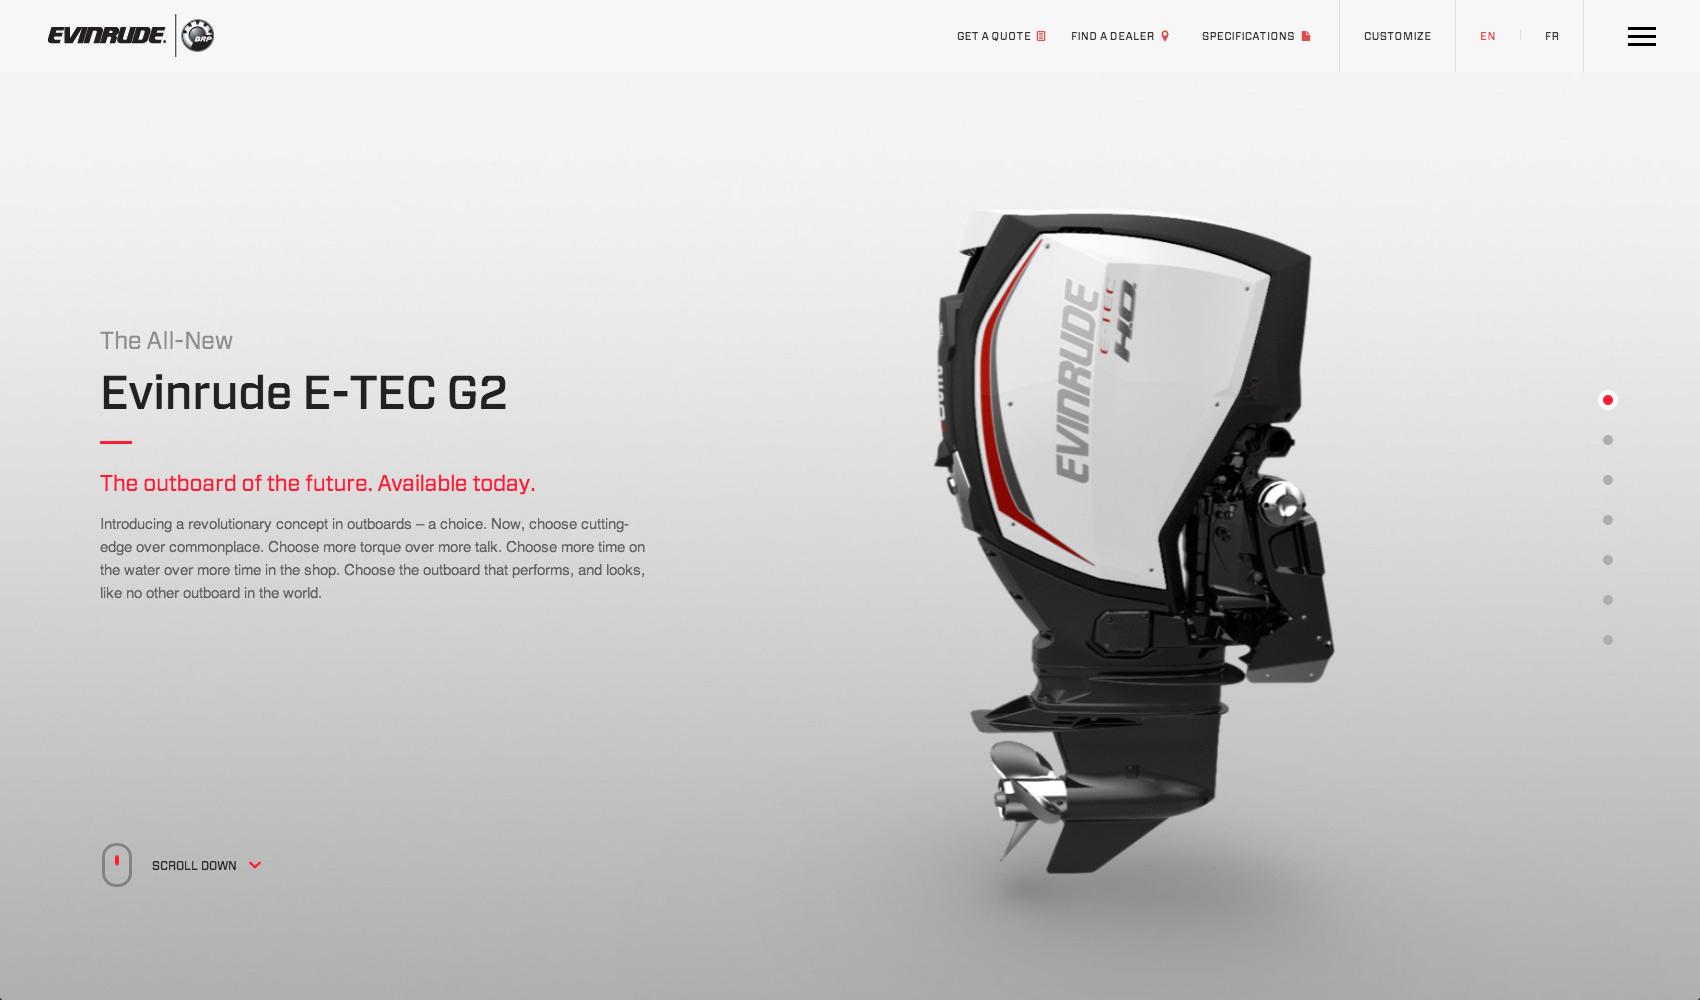 MB_evinrude-etec-g2_desktop-homepage